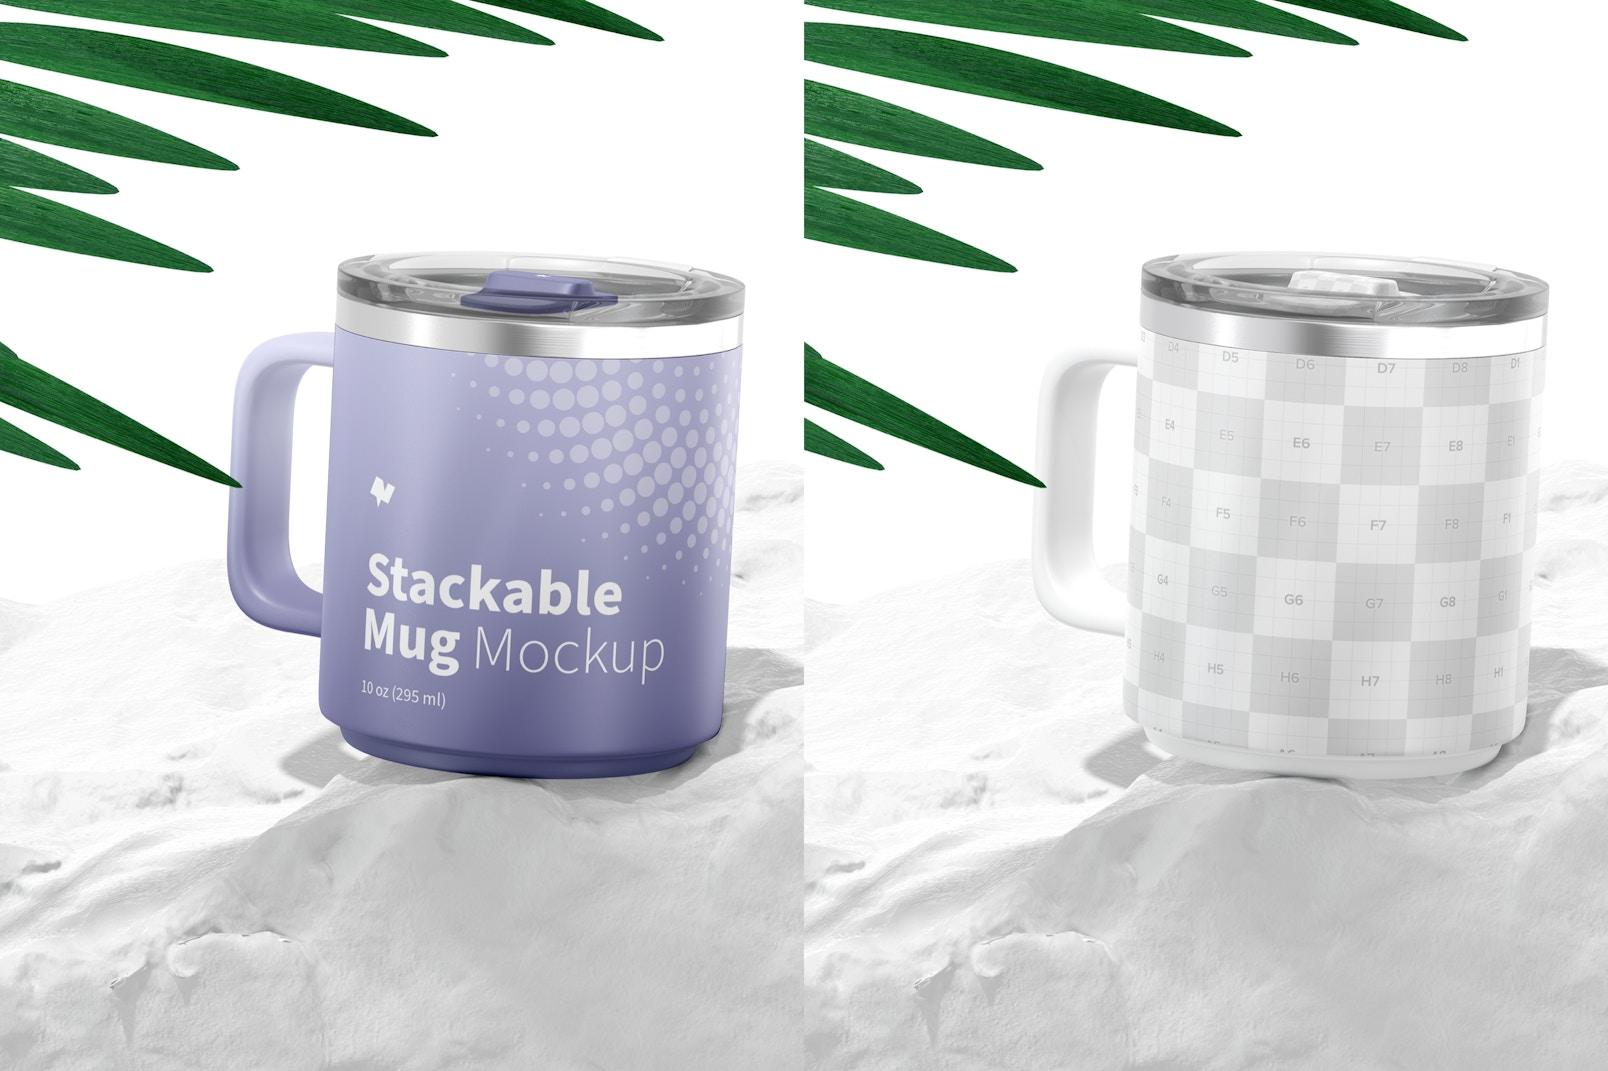 10 oz Stackable Mug Mockup, Perspective